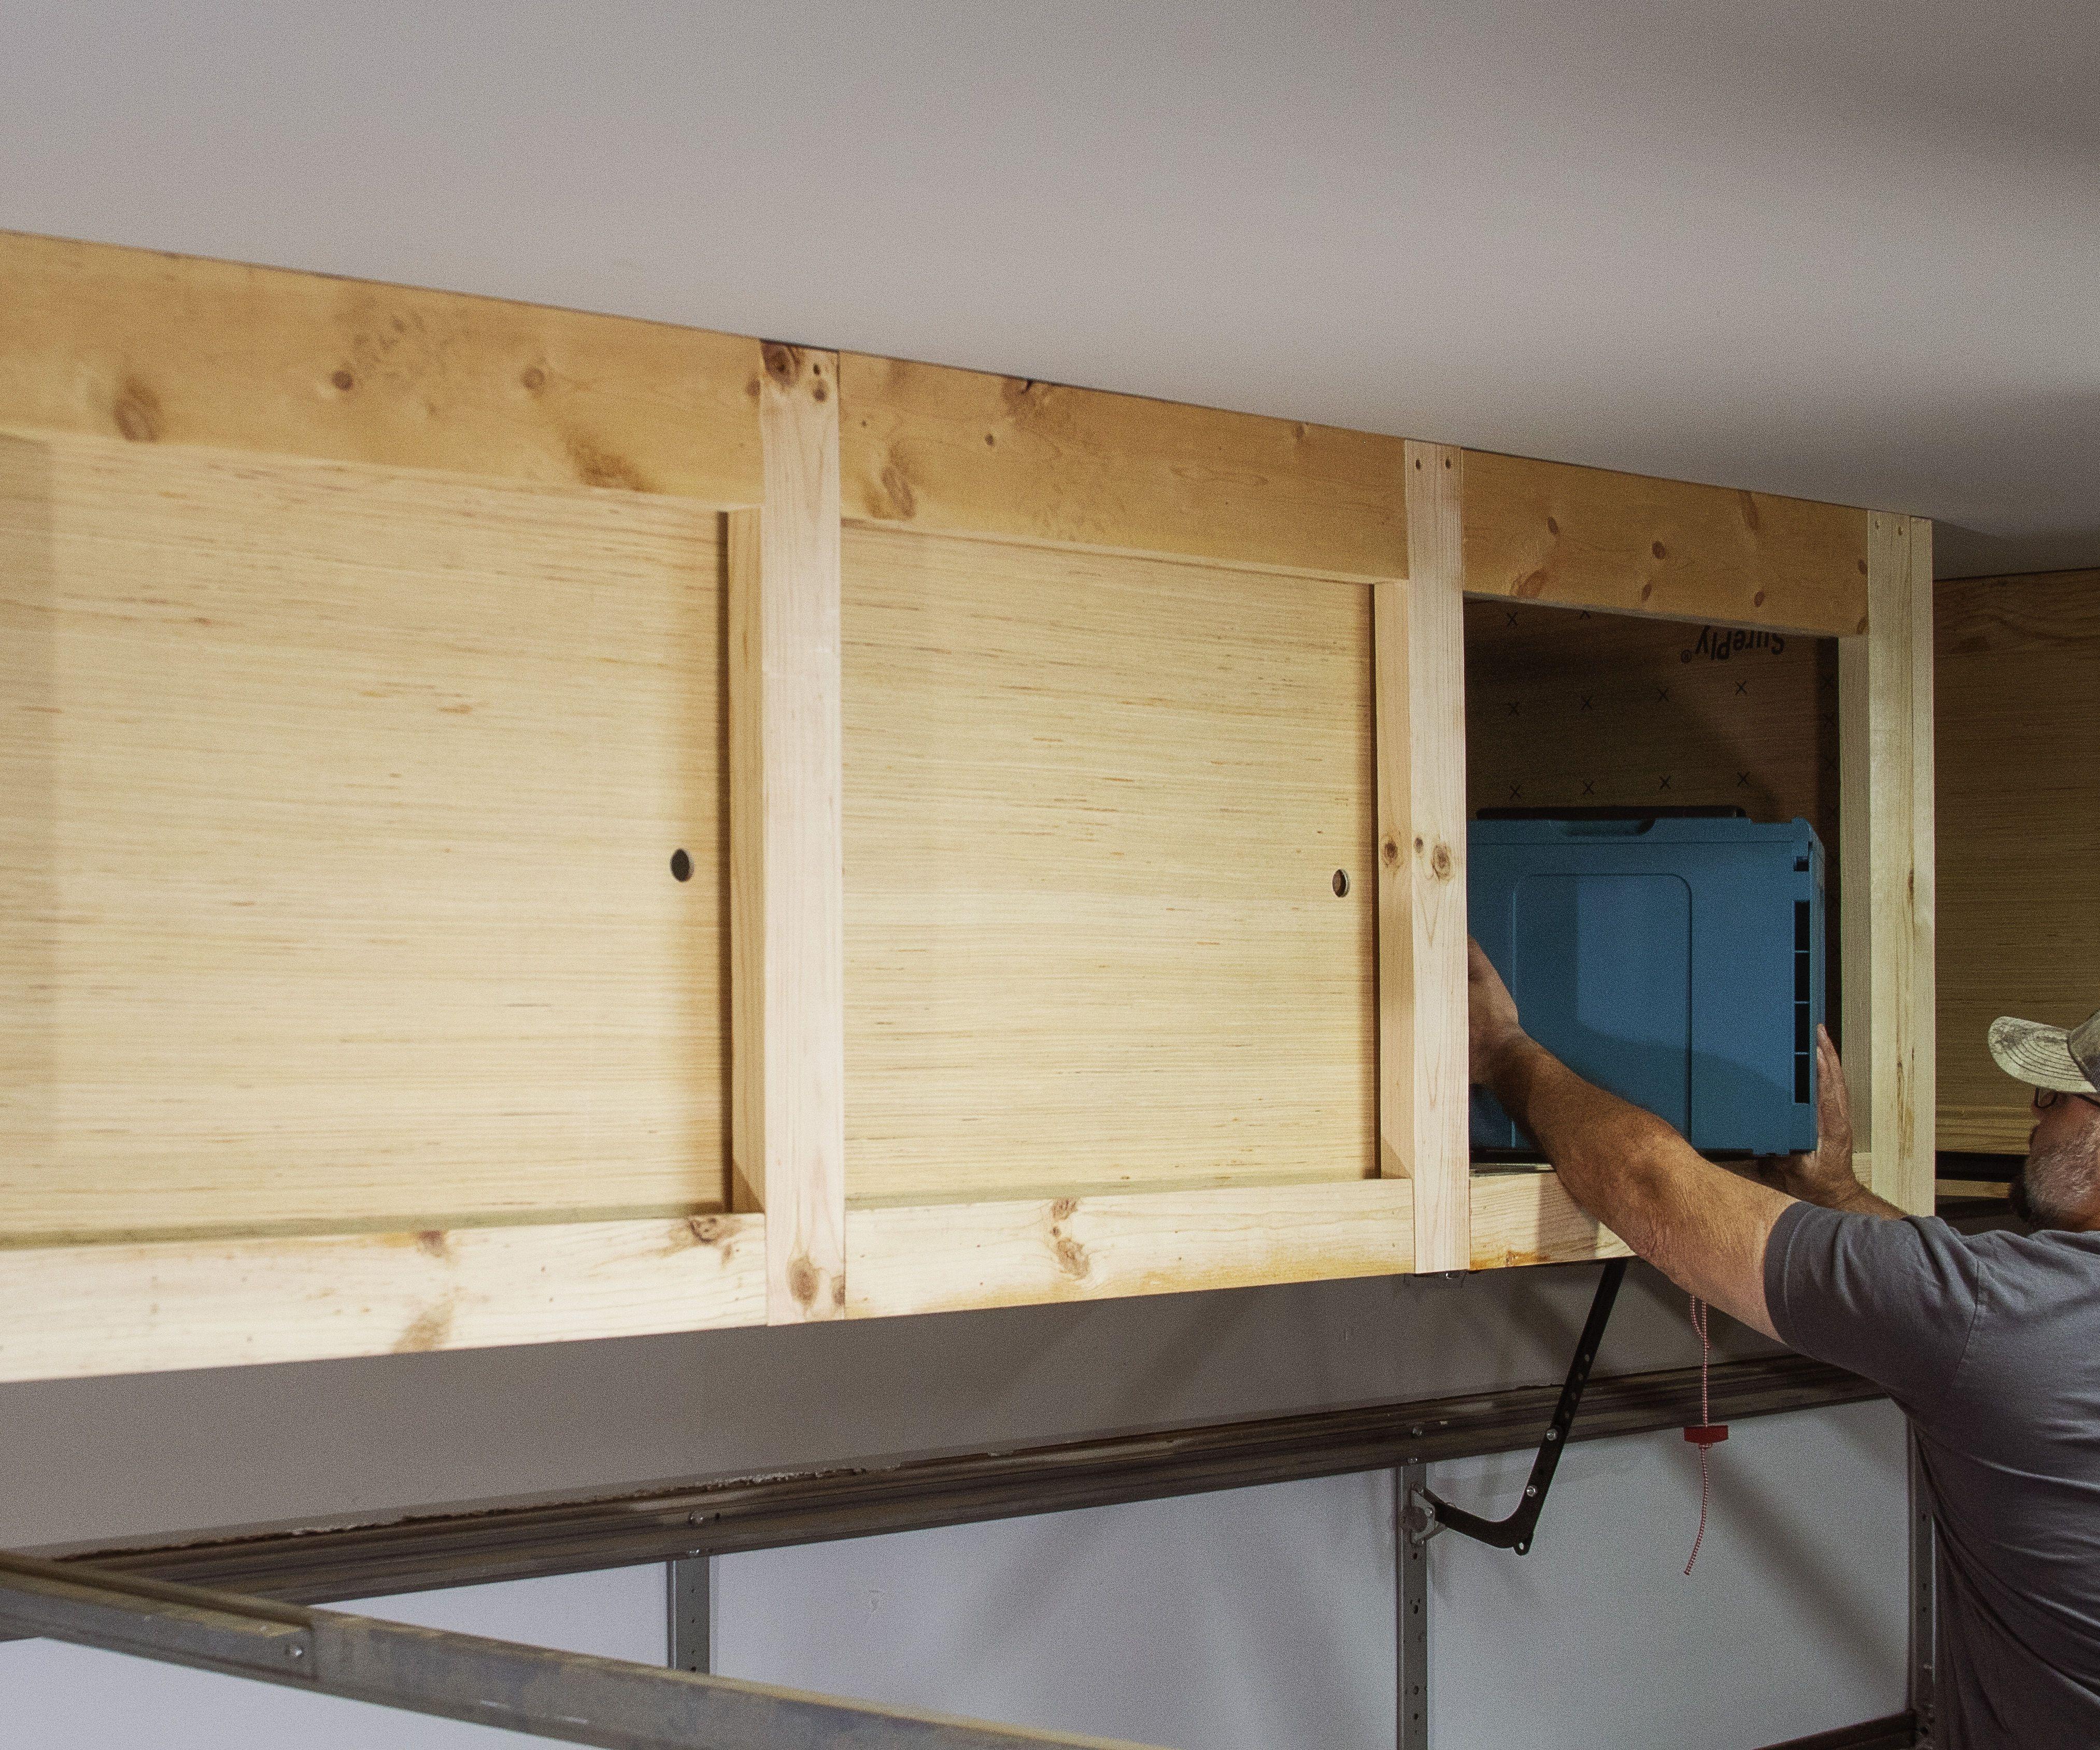 DIY Hanging Storage Shelves With Sliding Doors Overhead